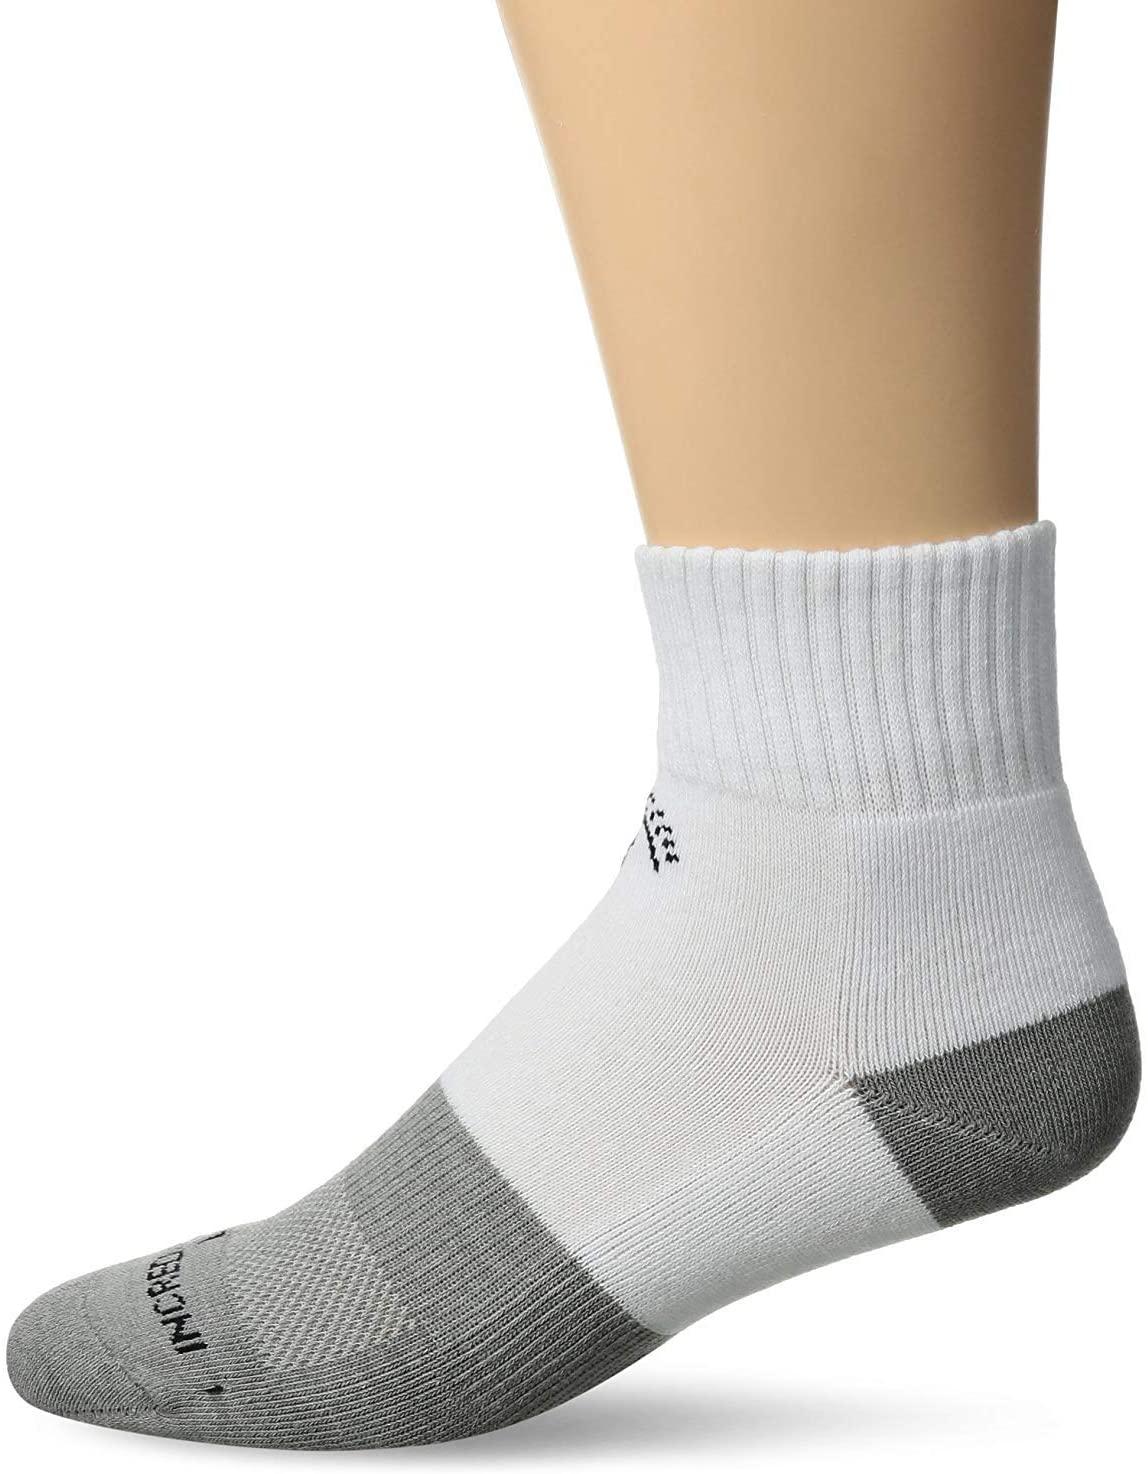 INCREDIWEAR Quarter Active Socks, White, Small, 0.03 Pound